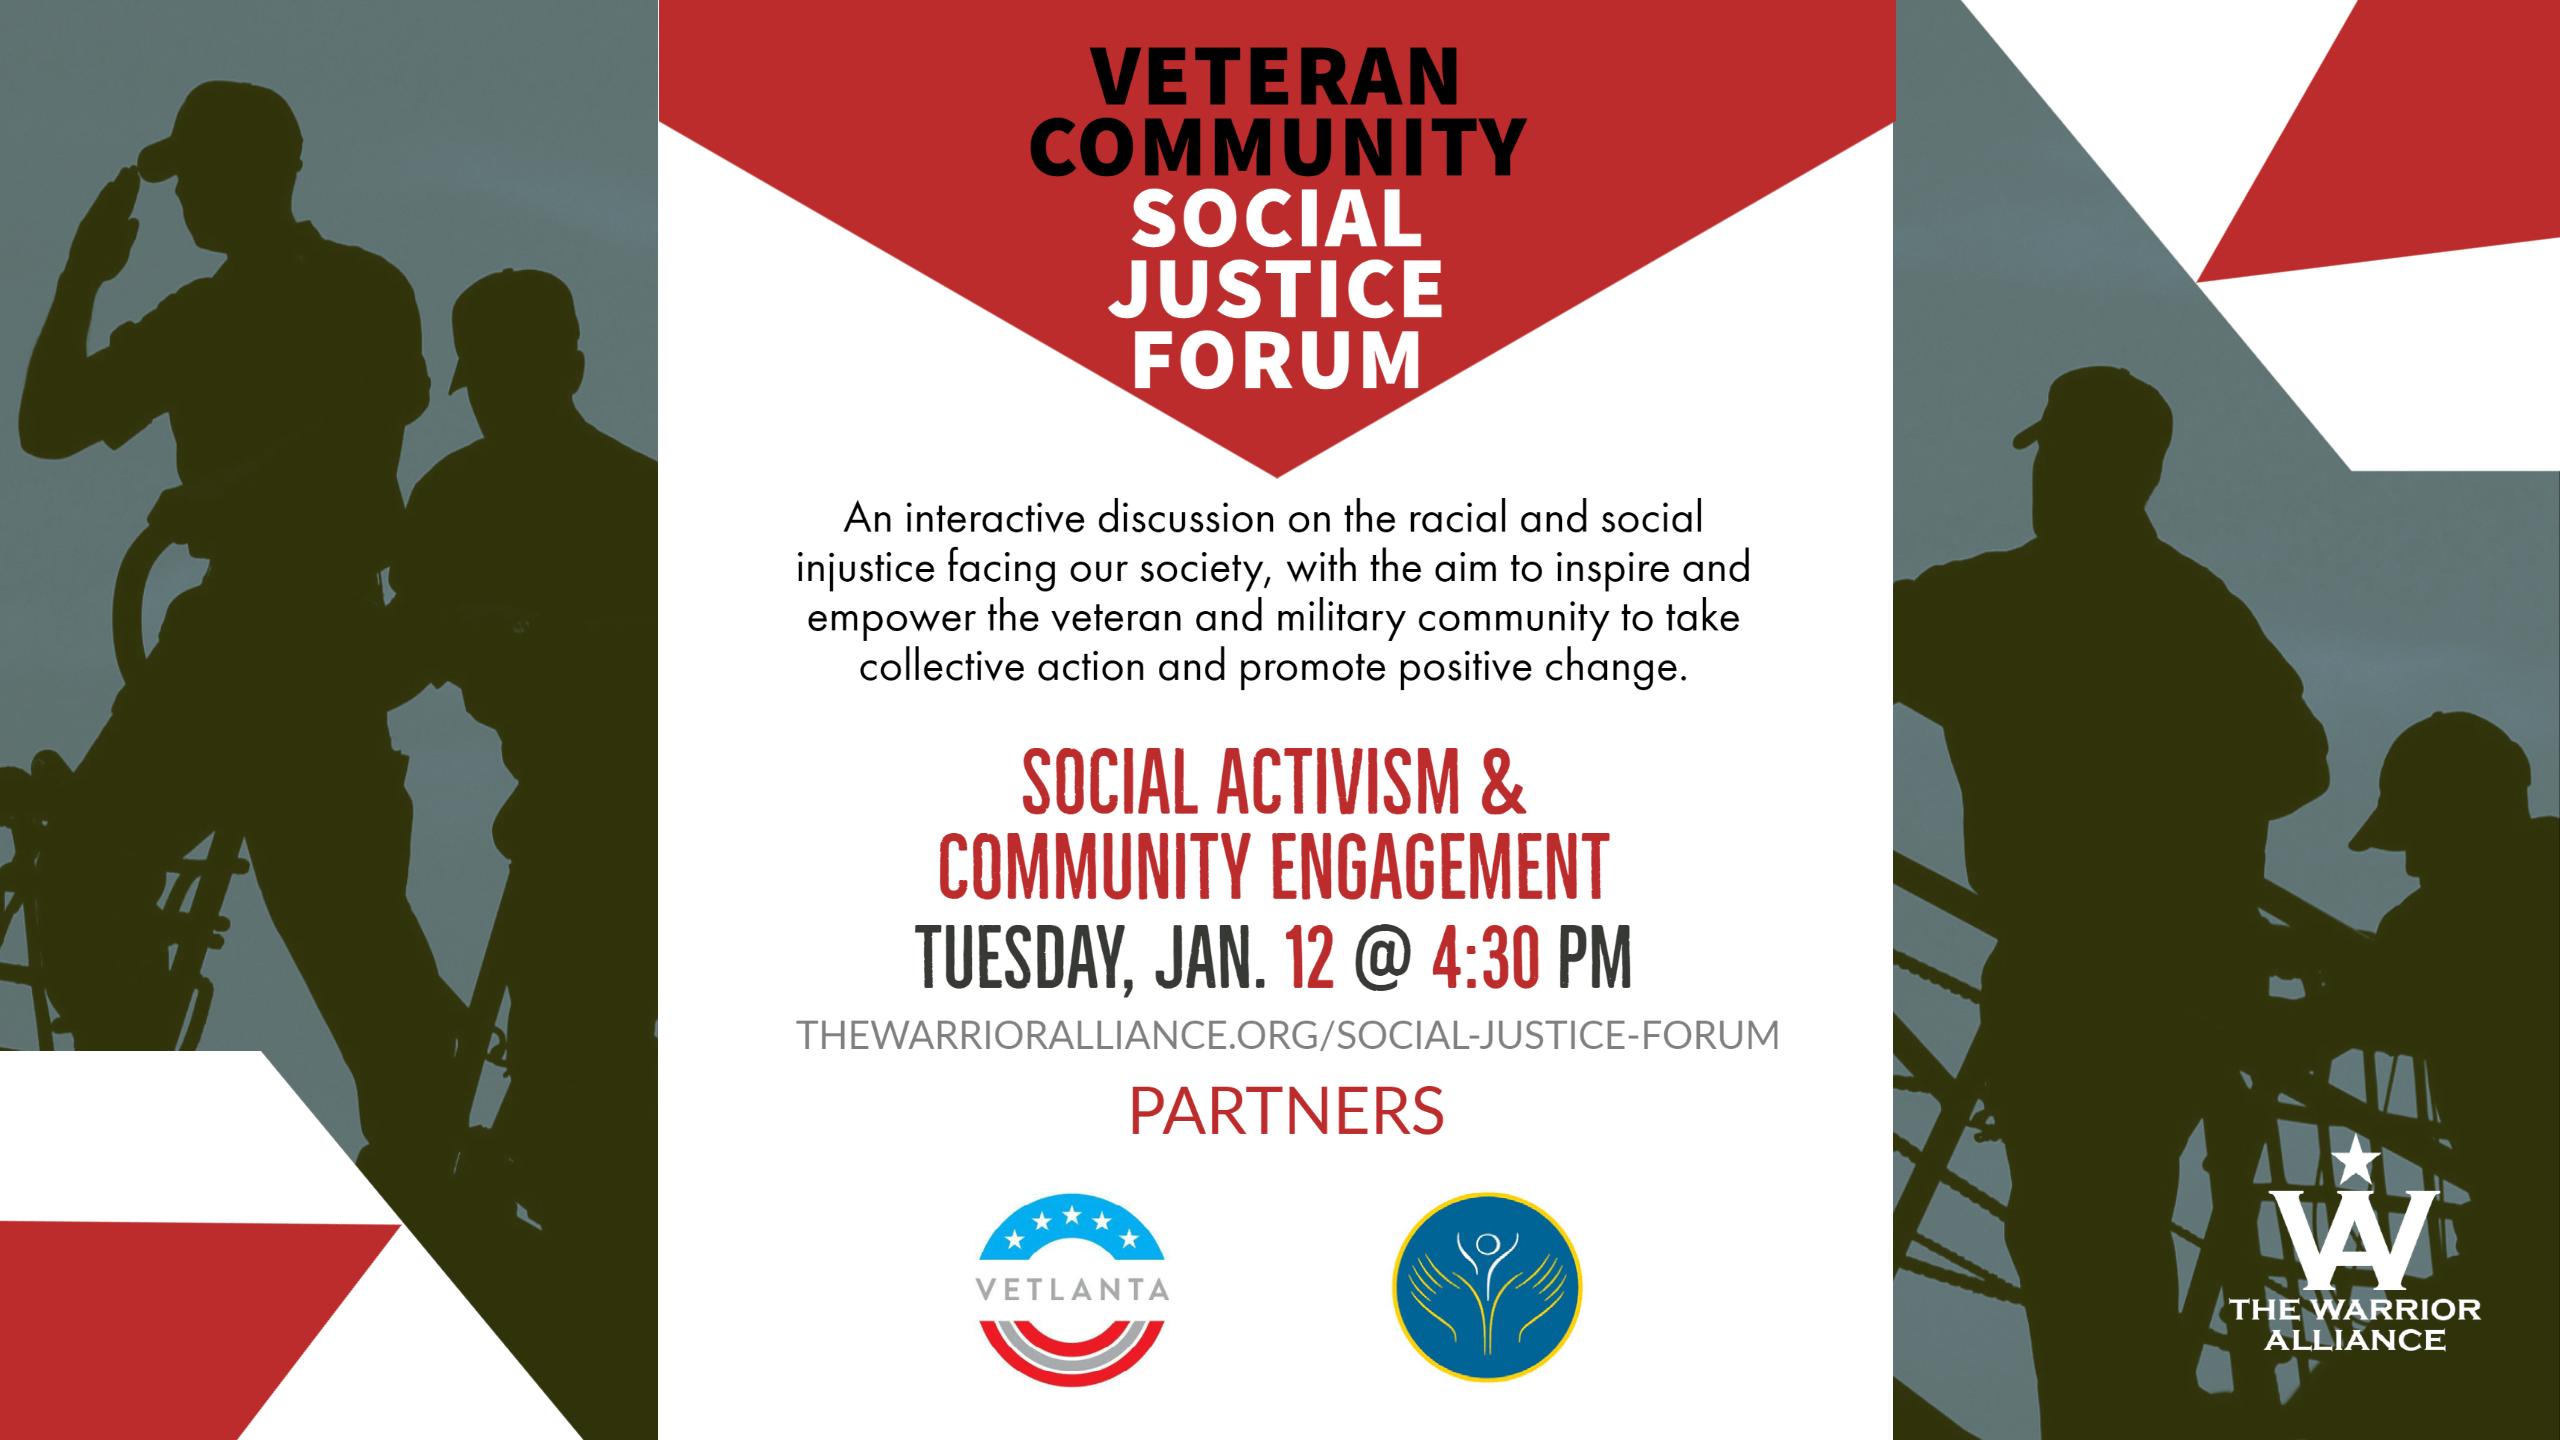 Veteran Community Social Justice Forum - Social Activism and Engagement January 12, 2021